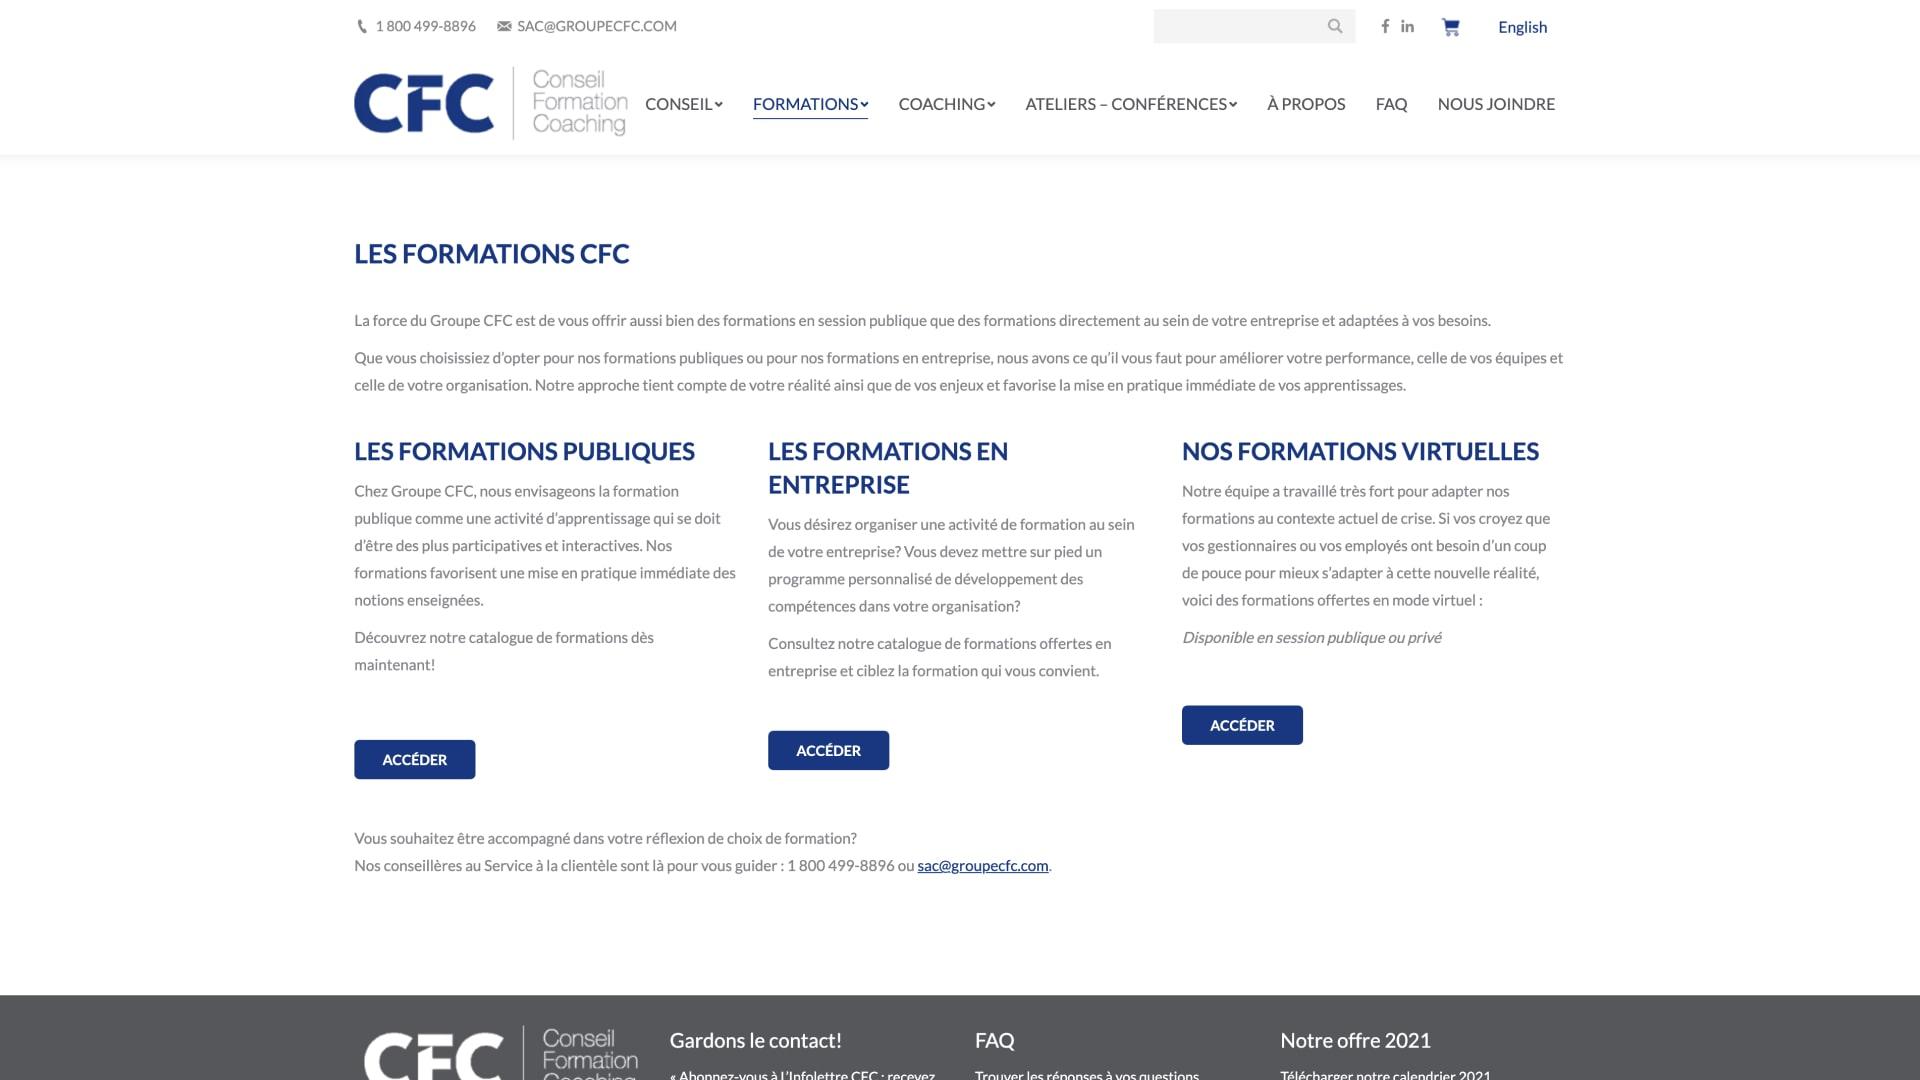 GroupeCFC-Formations-Sidney-Malgras-UX-UI-Designer